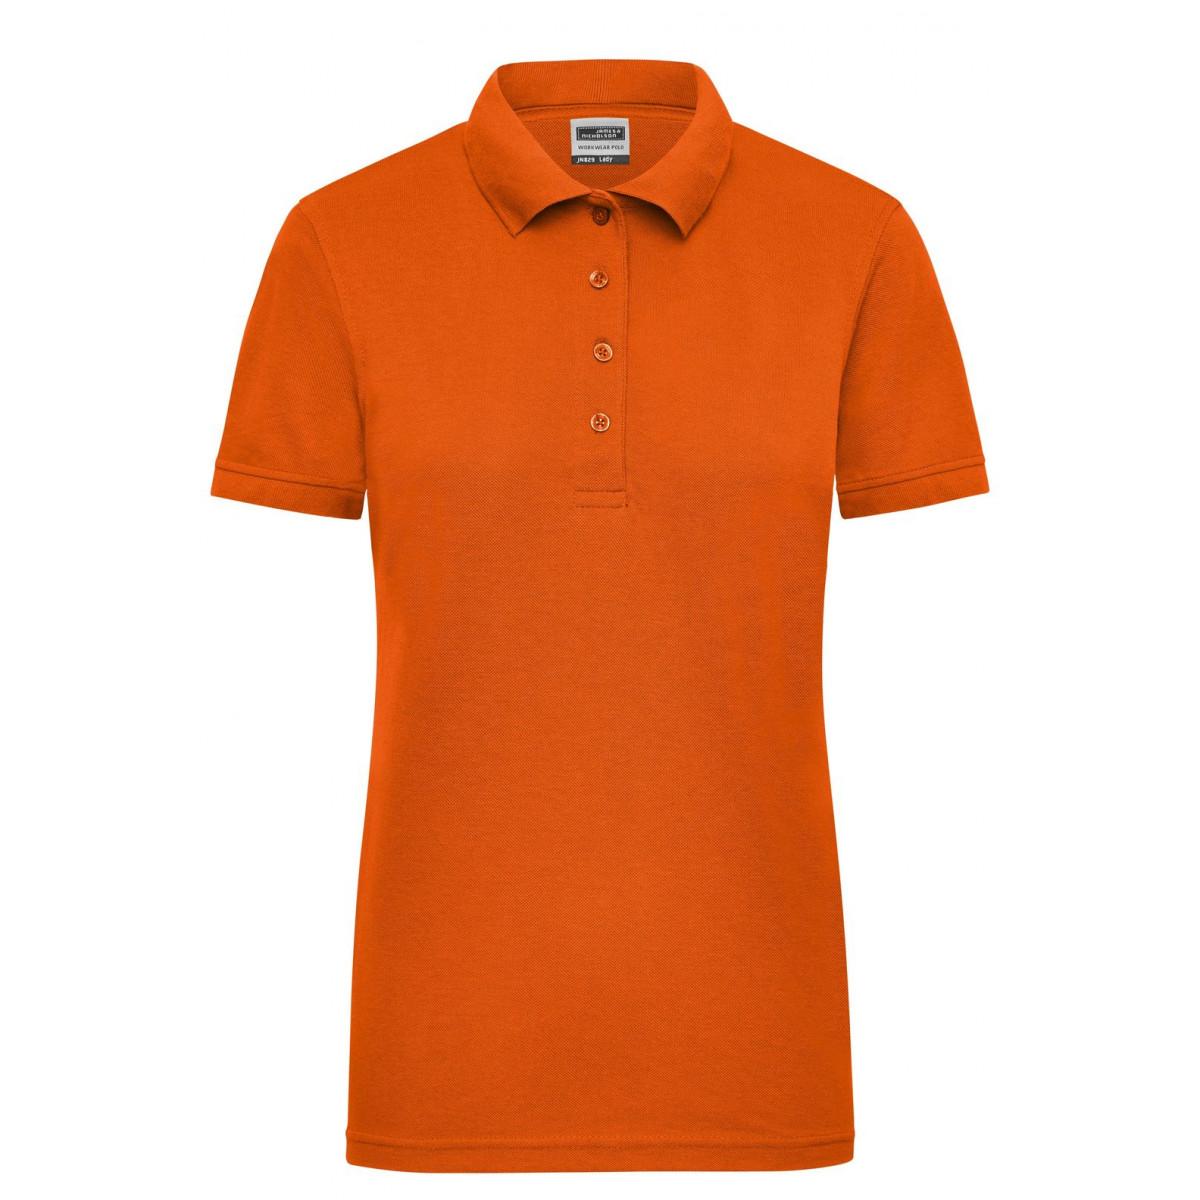 Рубашка поло женская JN829 Ladies Workwear Polo - Оранжевый